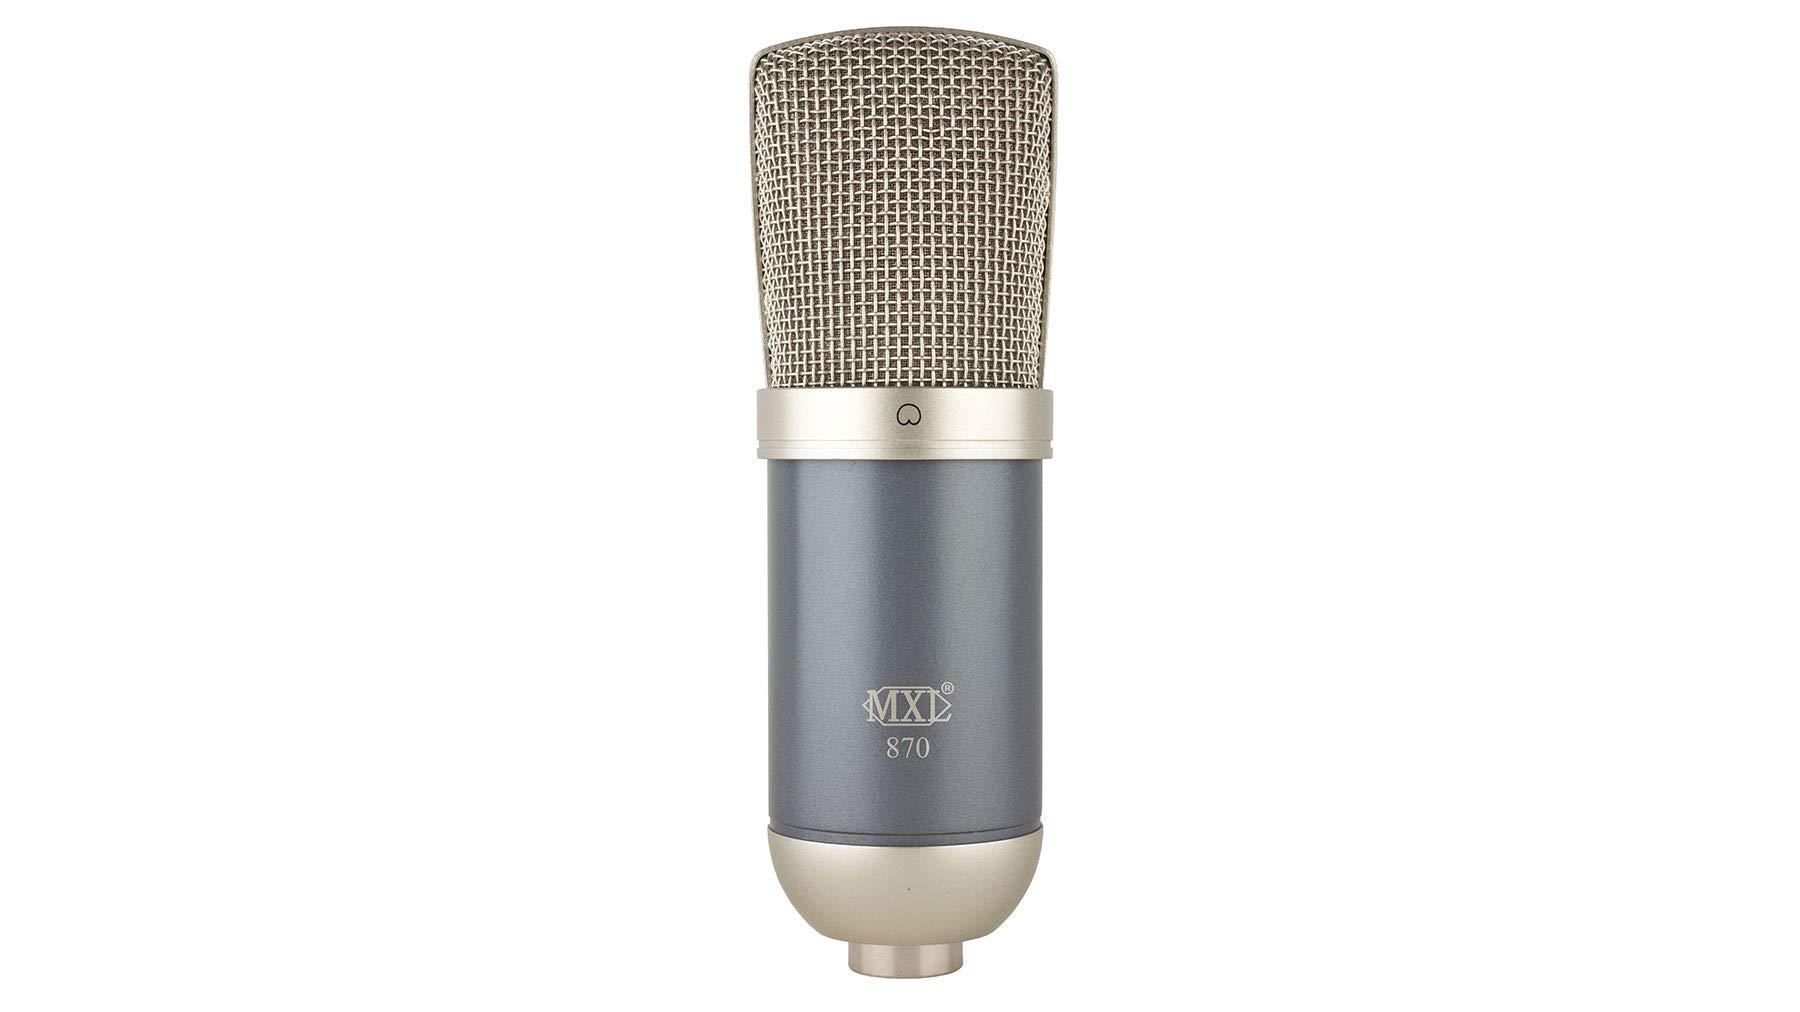 MXL 870 Versatile Studio Condenser Microphone